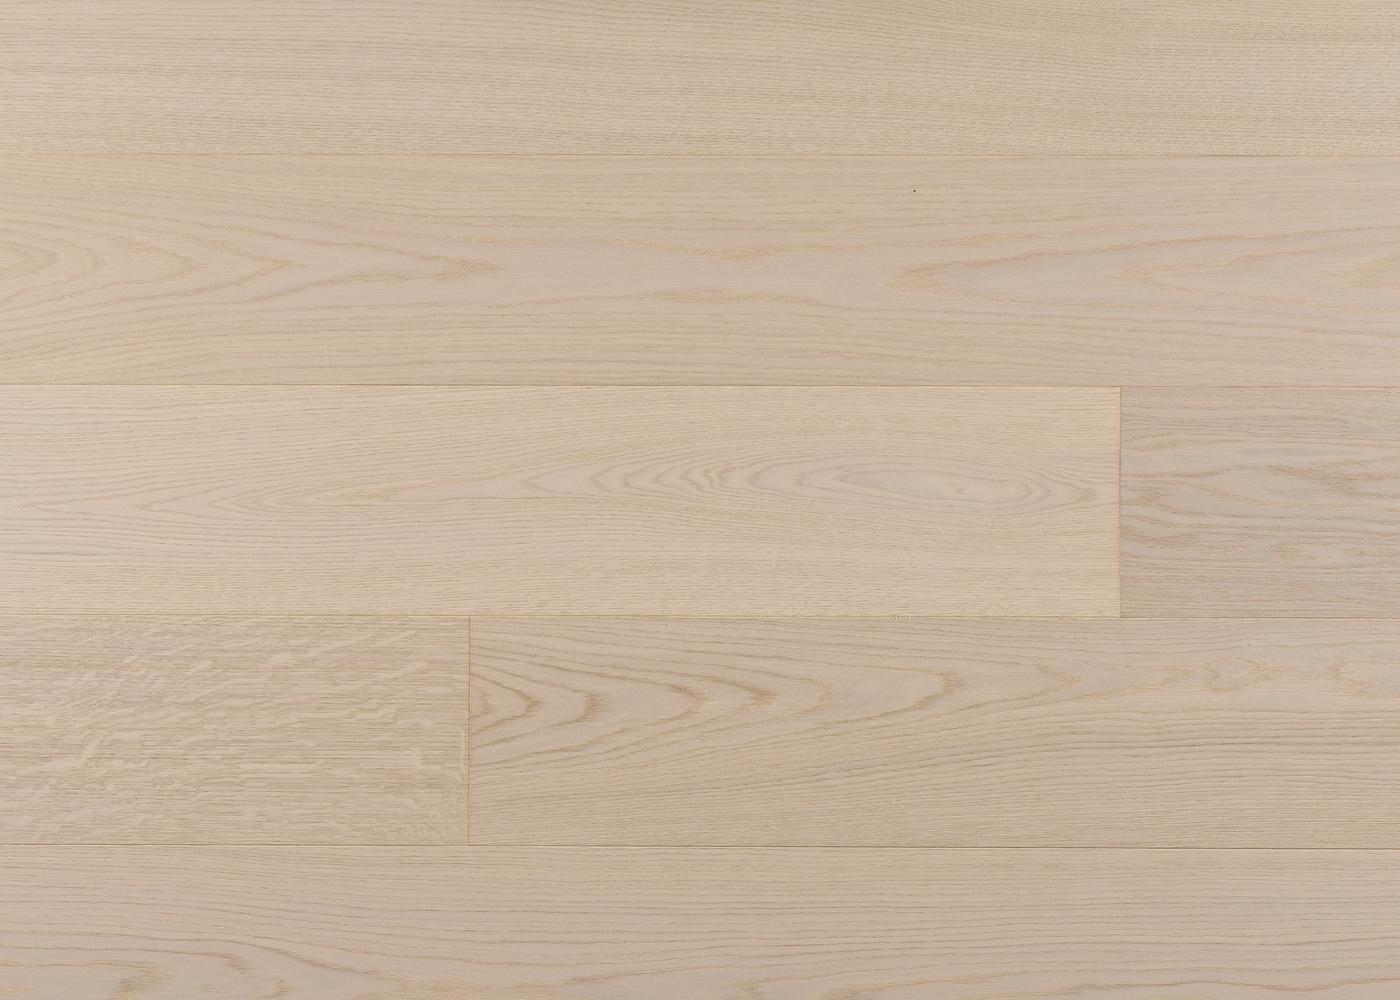 Parquet chêne contrecollé LUCERA brossé vernis Select support HDF 10x92x1420